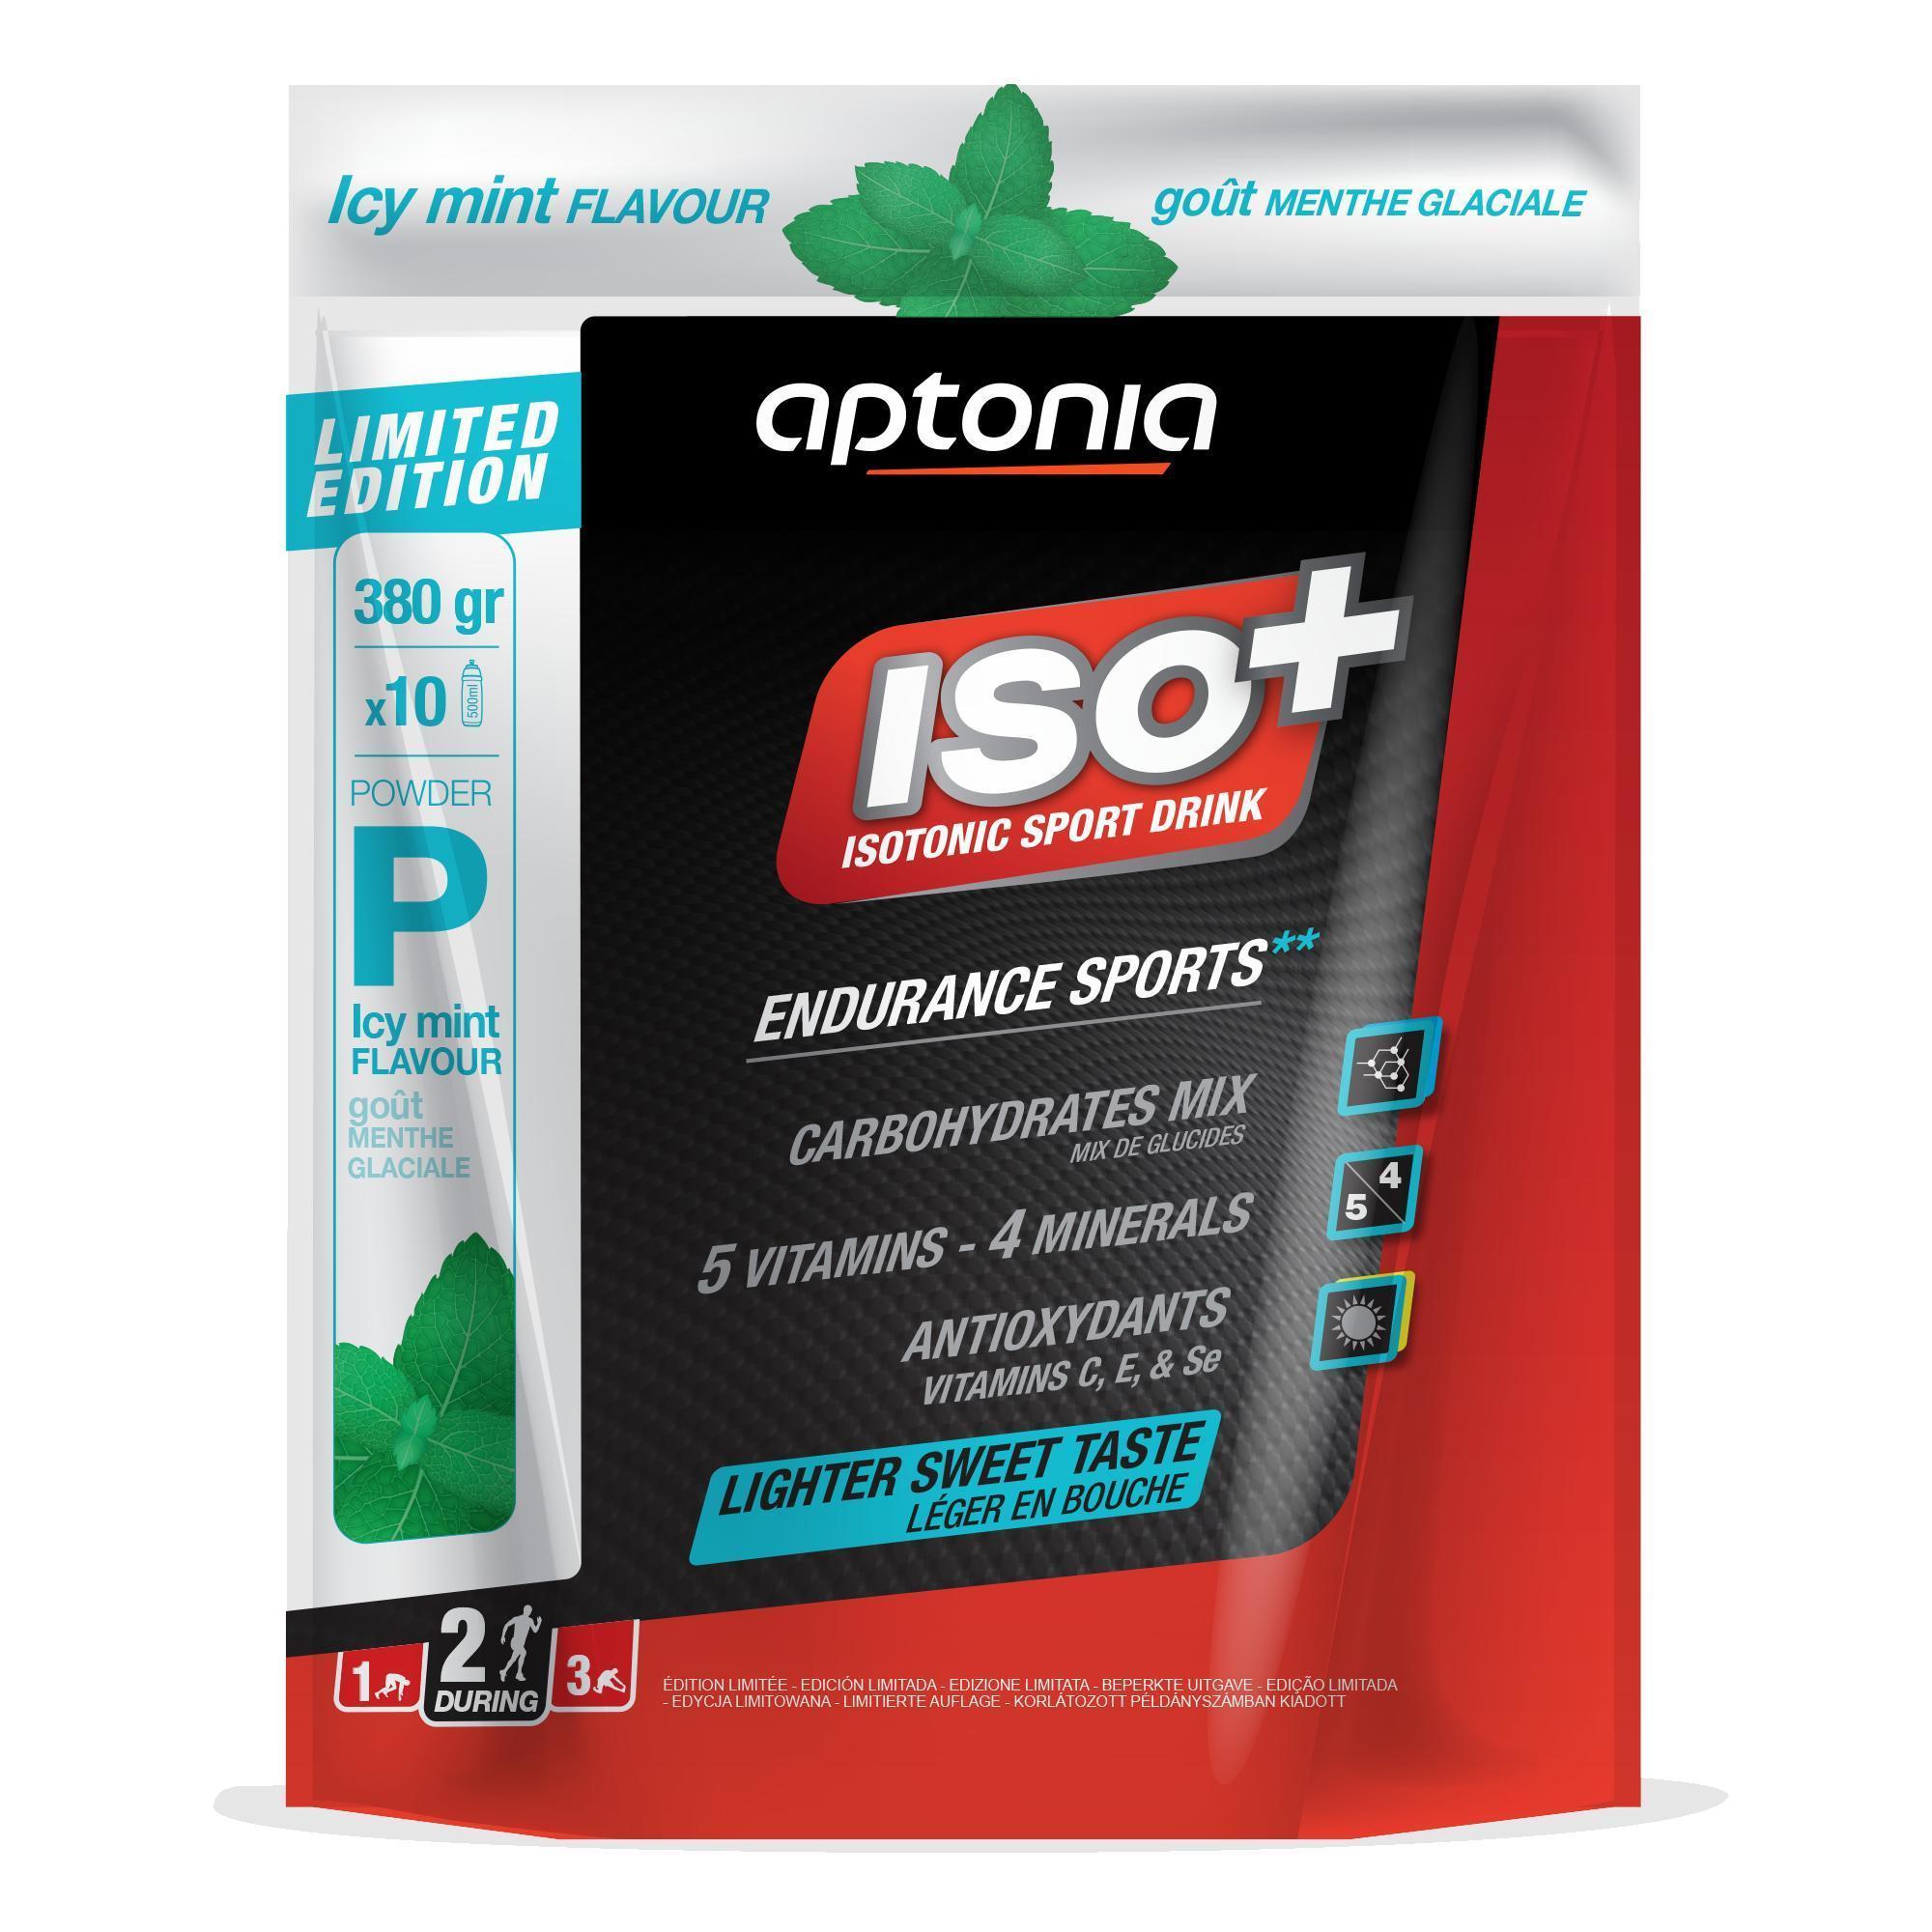 Aptonia Poeder voor isotone dorstlesser ISO+ frisse munt 380 g